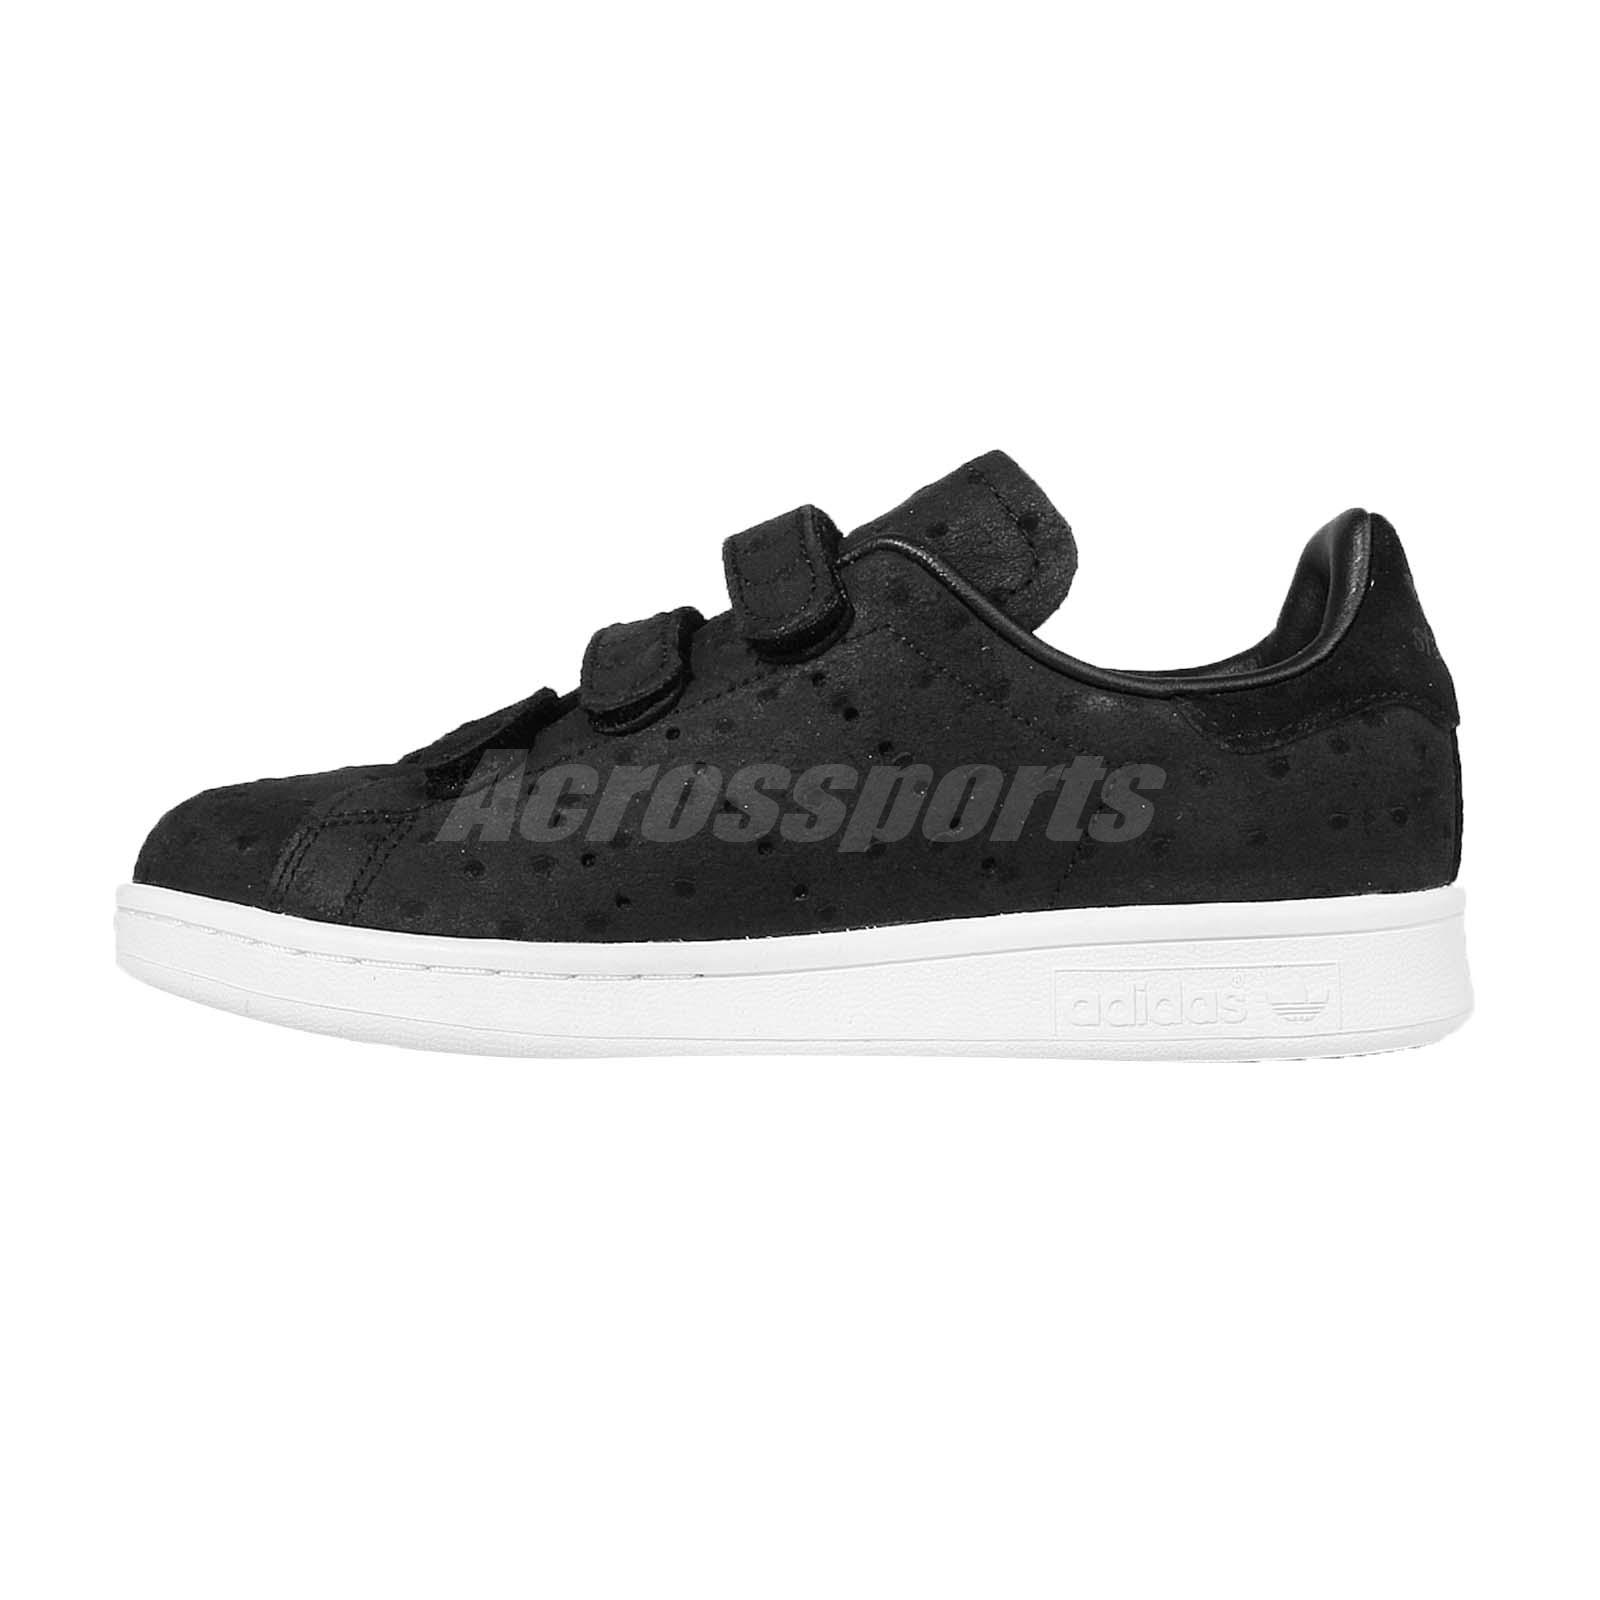 adidas originals stan smith cf w black white womens classic shoe sneakers s78905 ebay. Black Bedroom Furniture Sets. Home Design Ideas